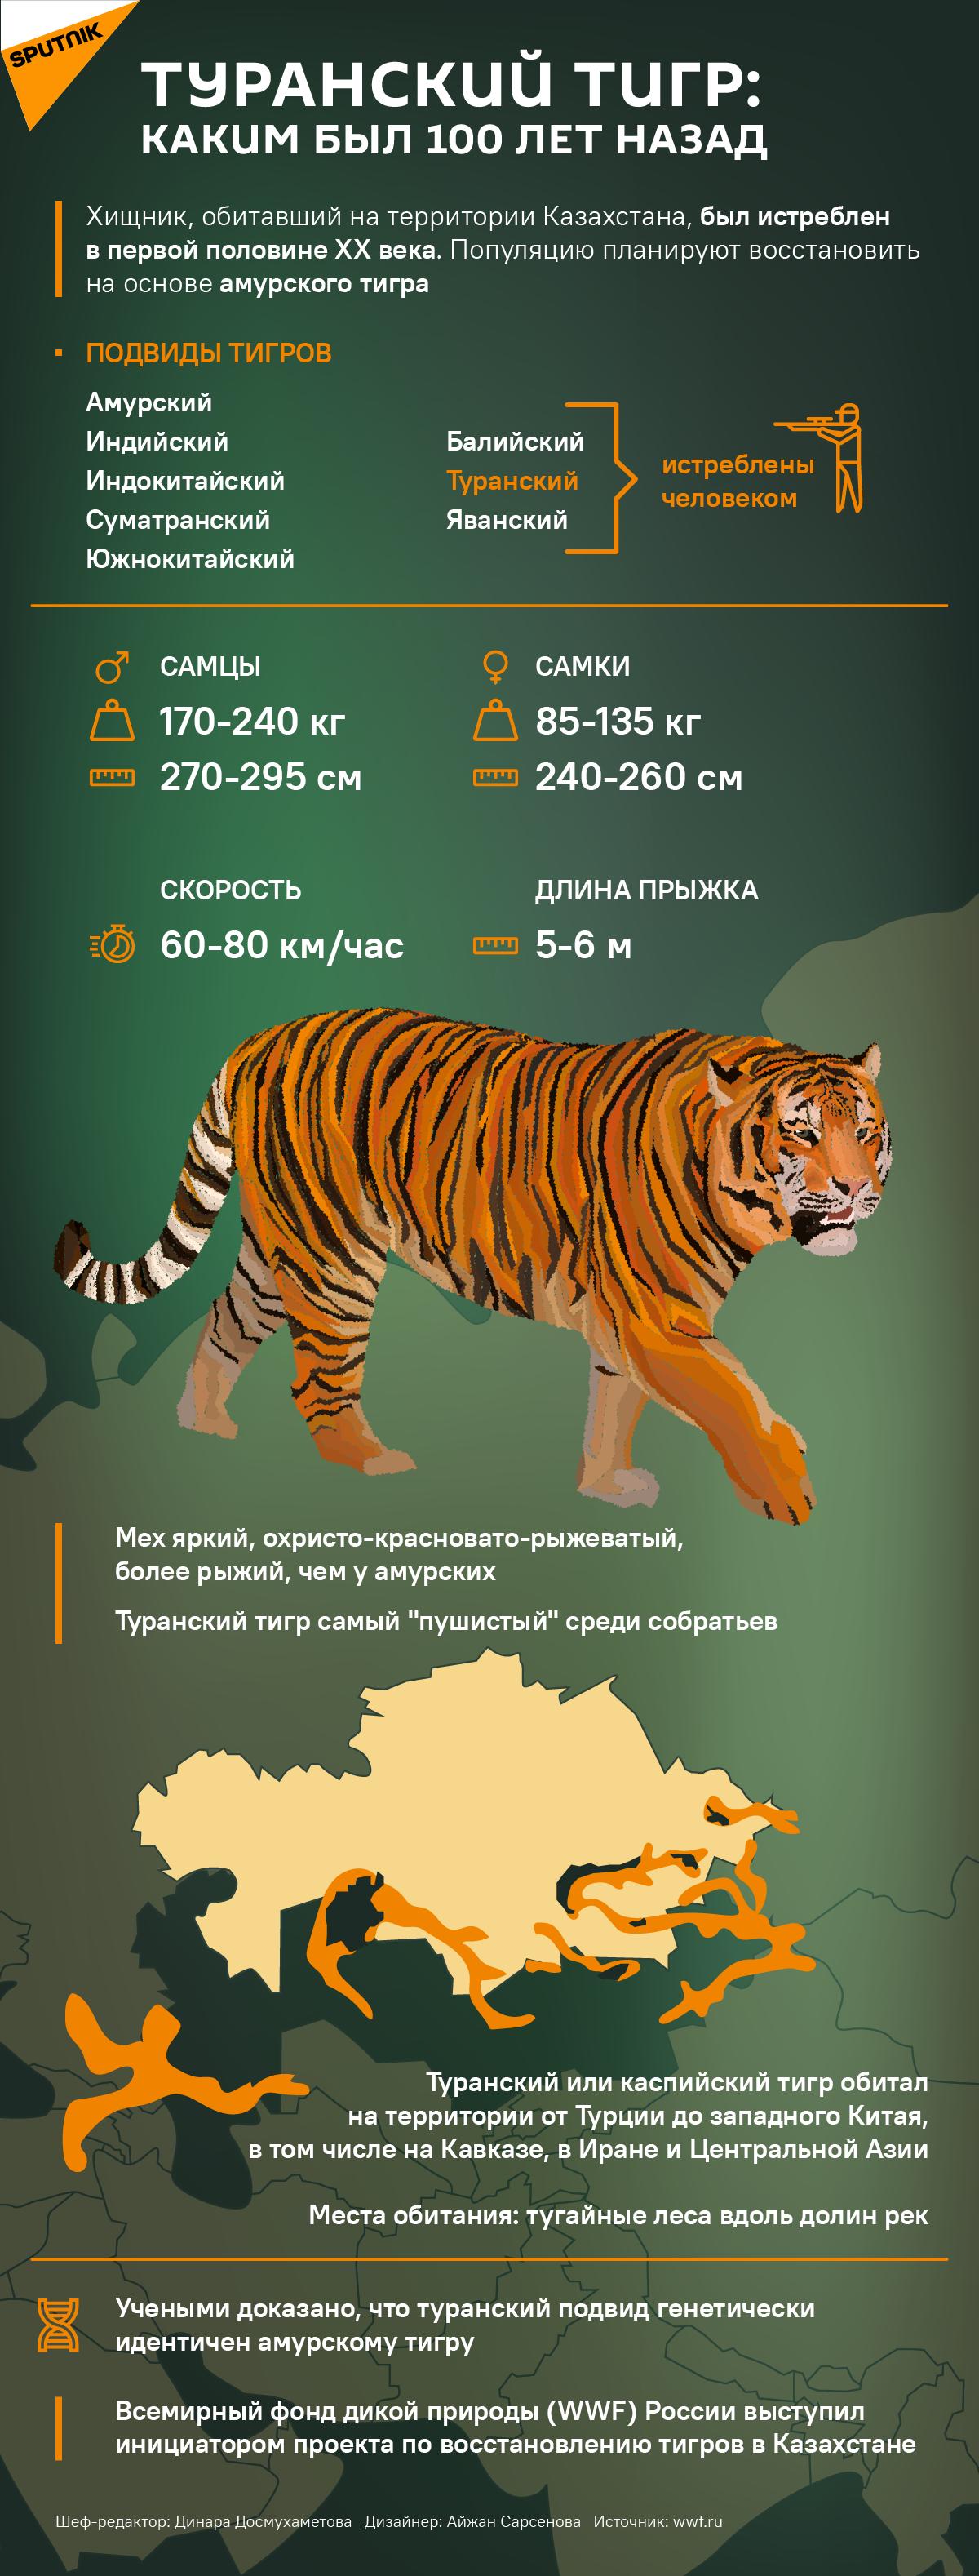 Туранский тигр: каким был 100 лет назад